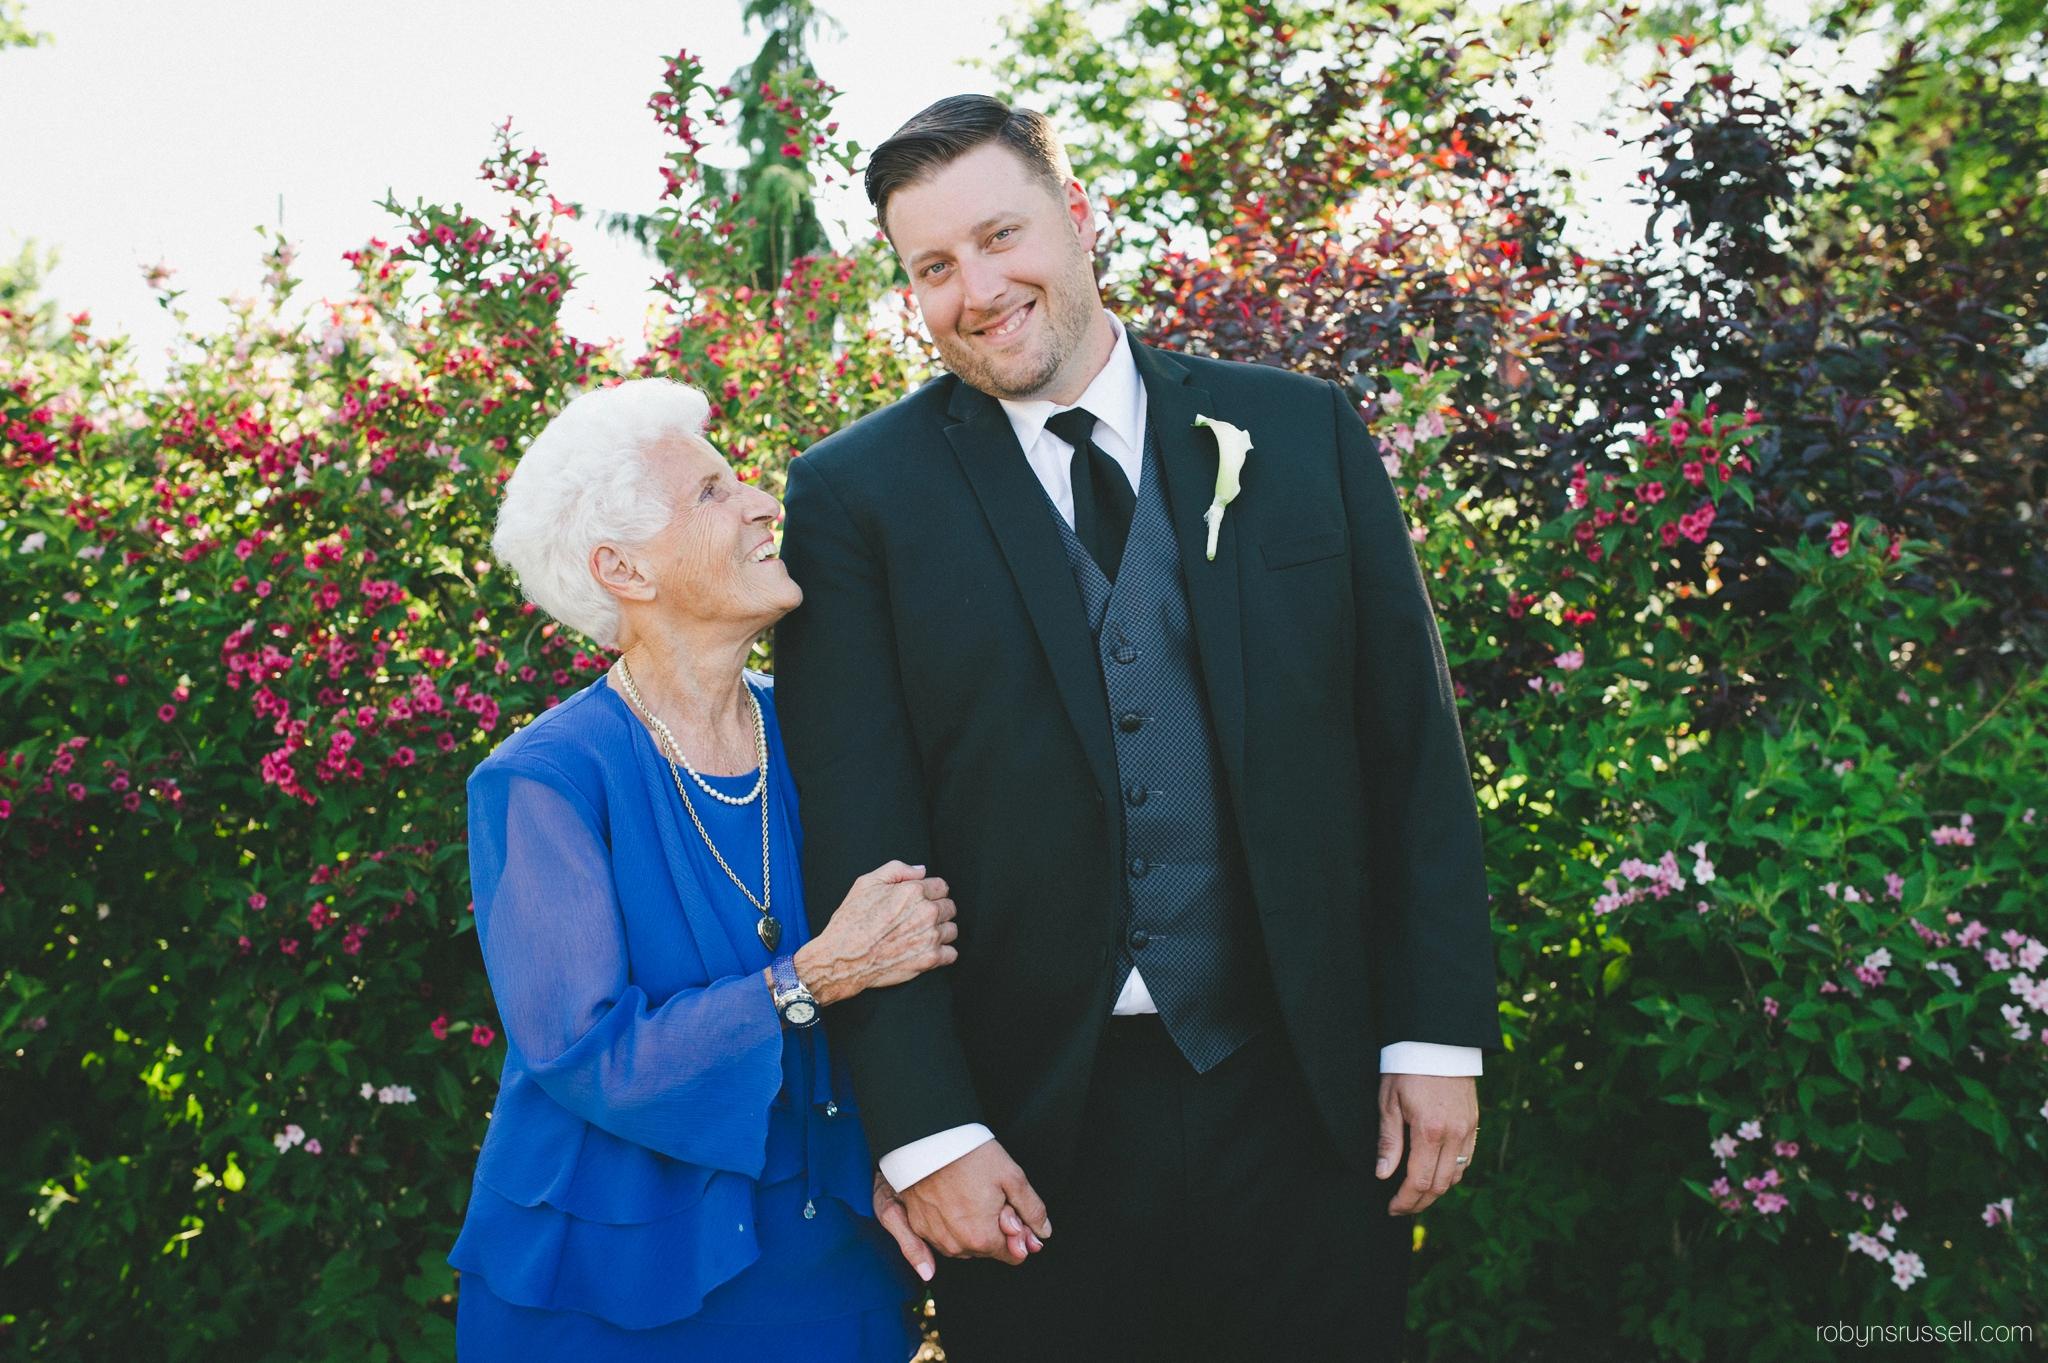 30-groom-with-grandmother-on-wedding-day.jpg